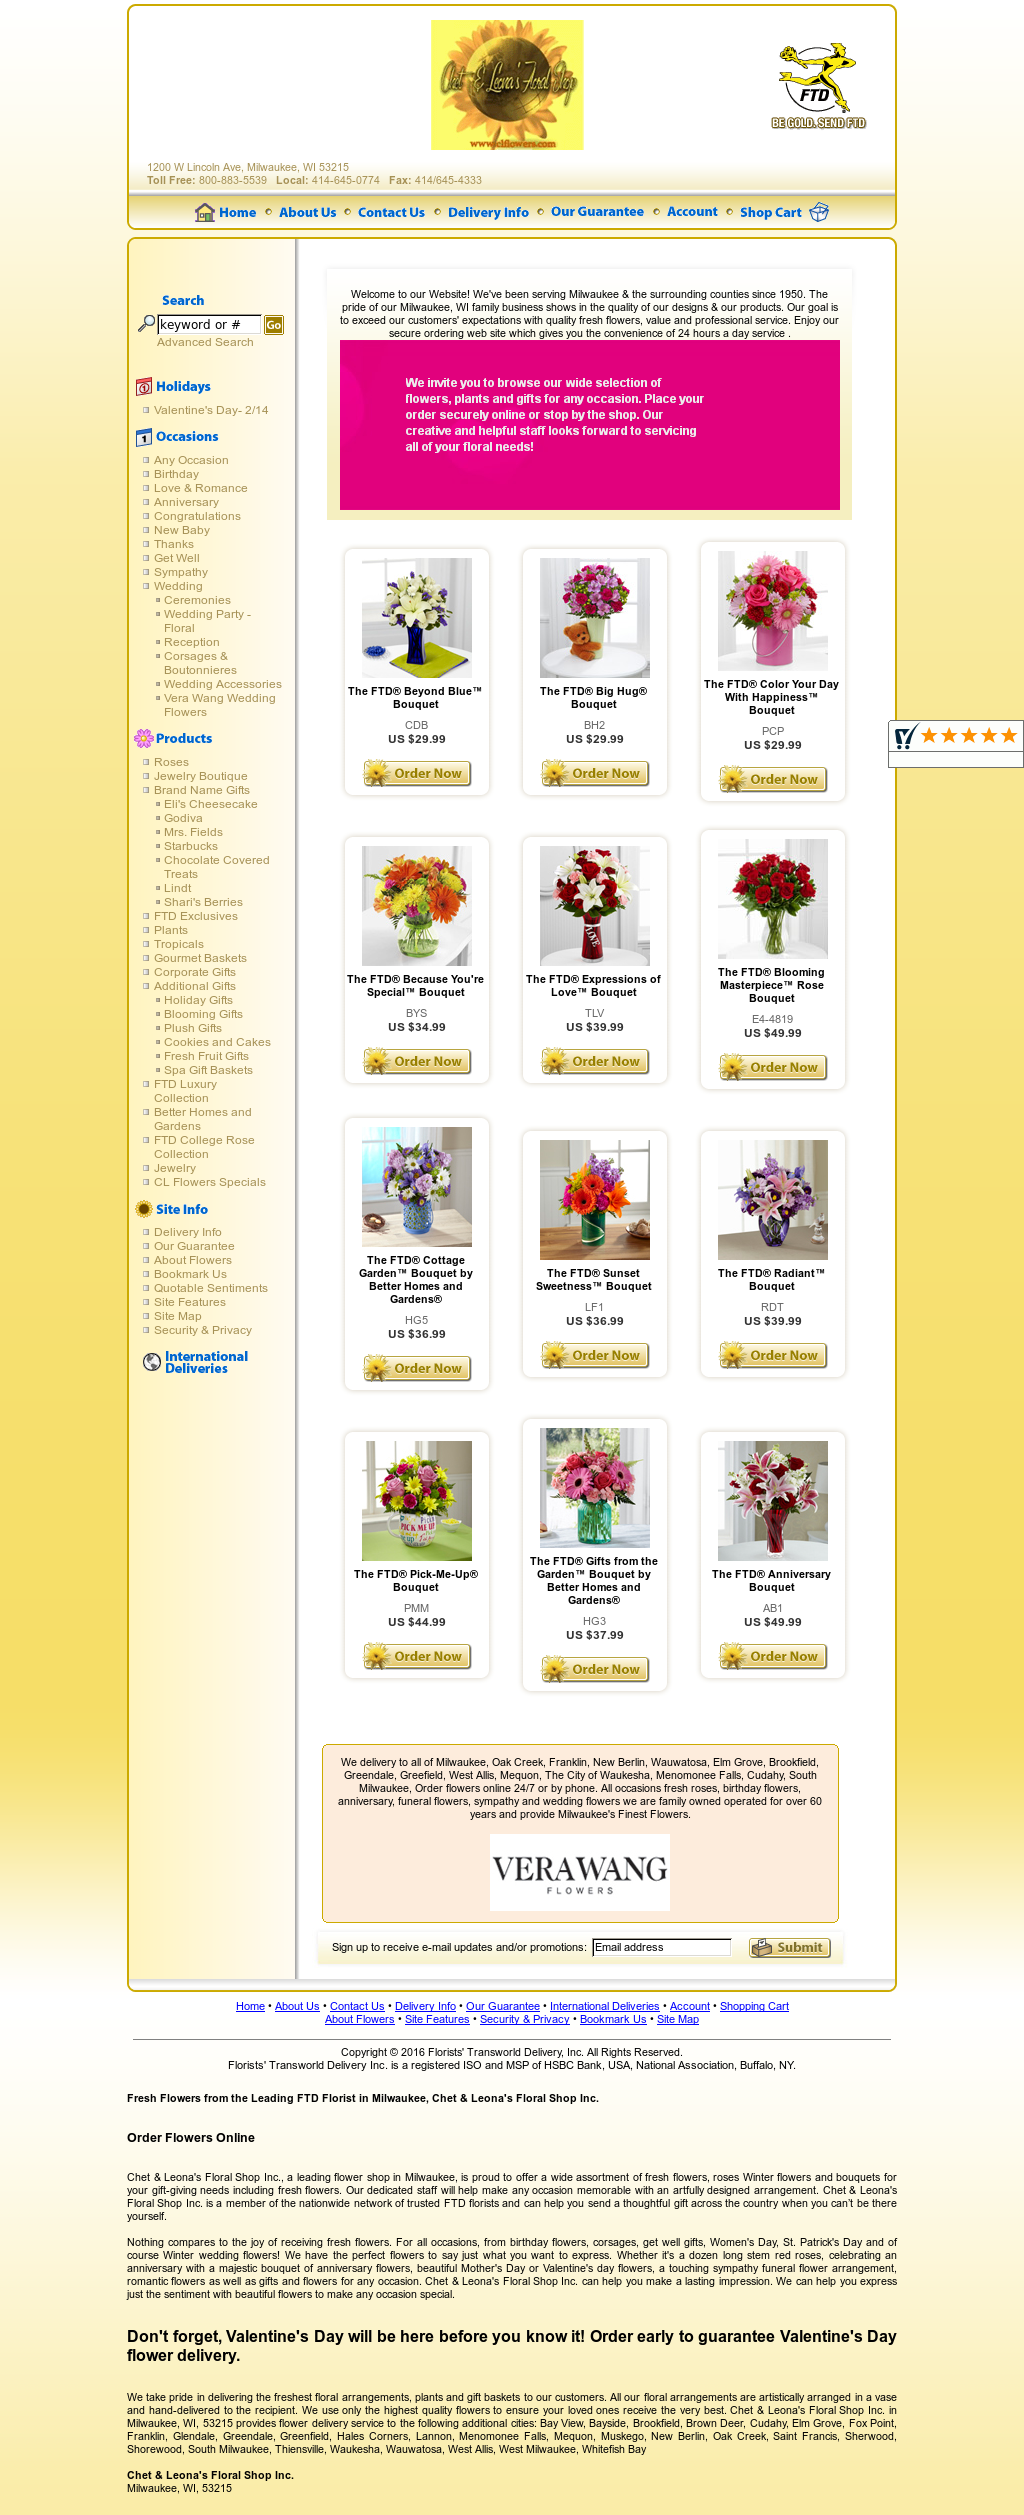 Chet & Leona's Floral Shop Competitors, Revenue and